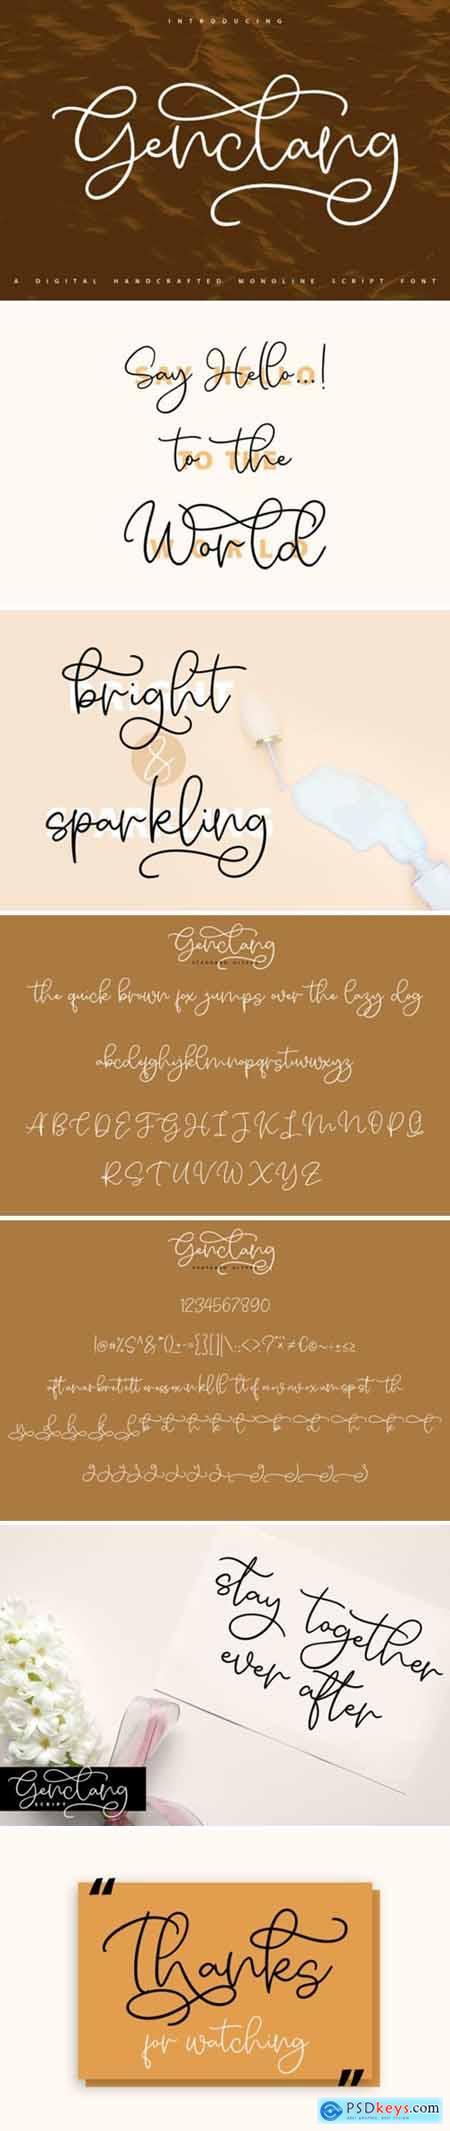 Genclang Font